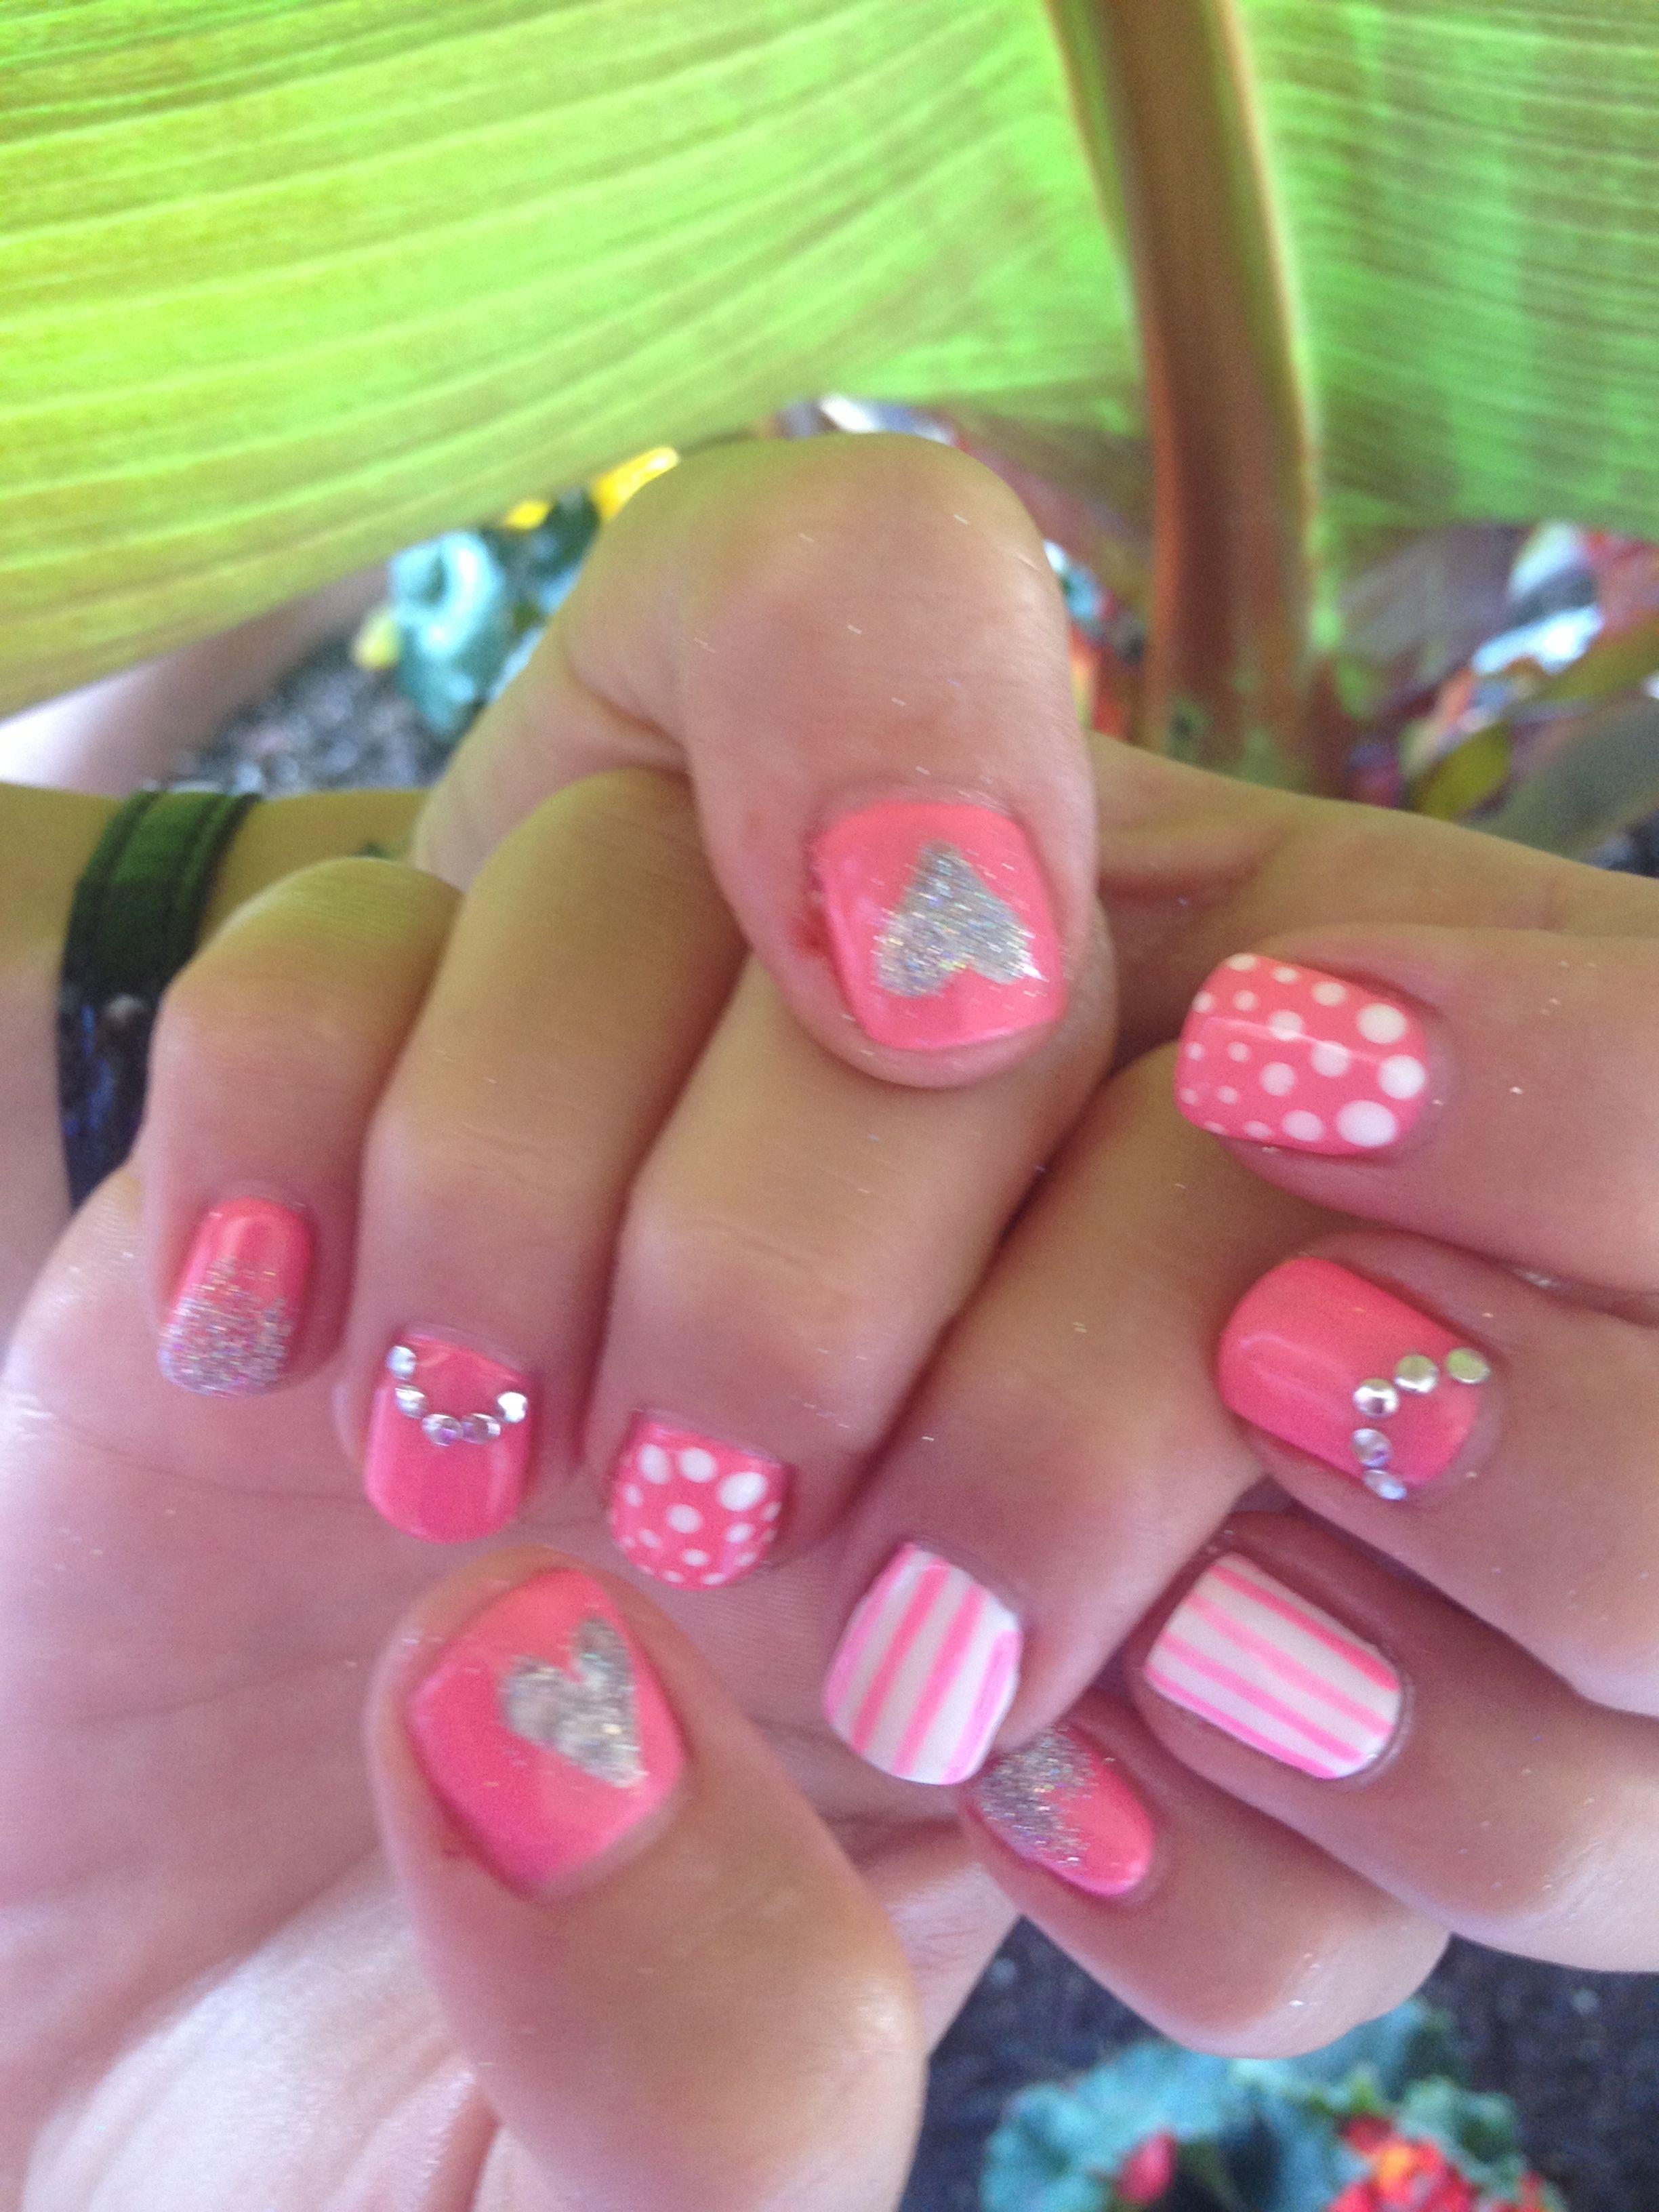 Gel nails by Erin Hart at The Nail Lounge in Costa Mesa | Nails ...